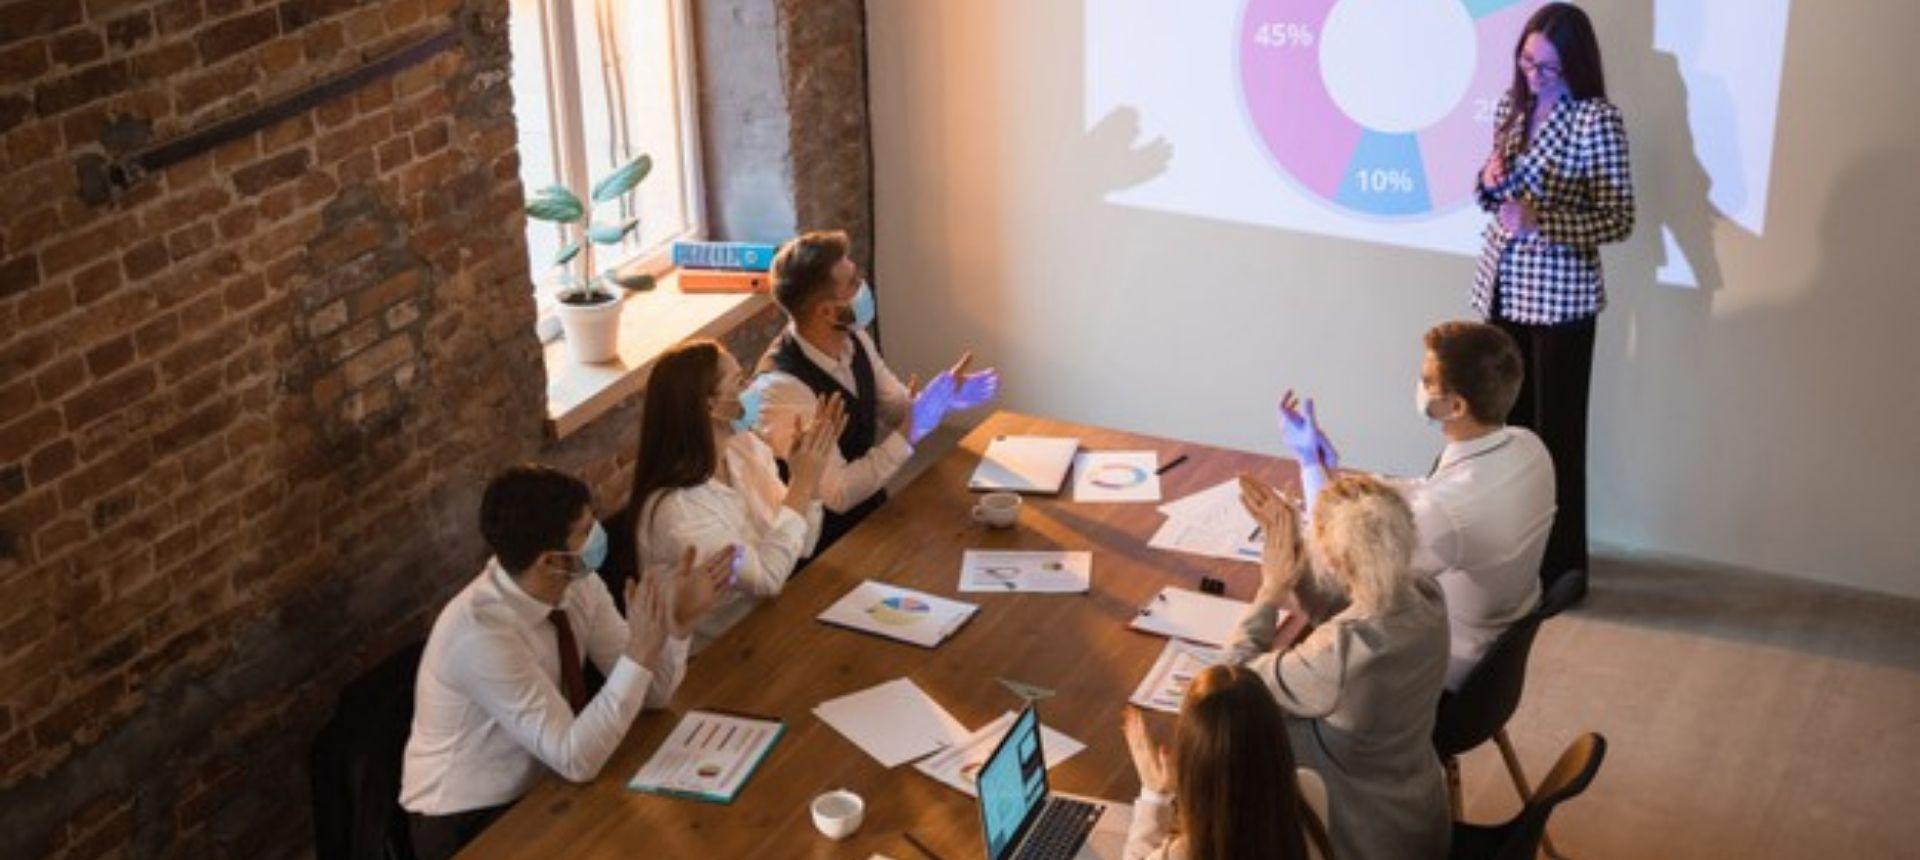 presentation meeting room